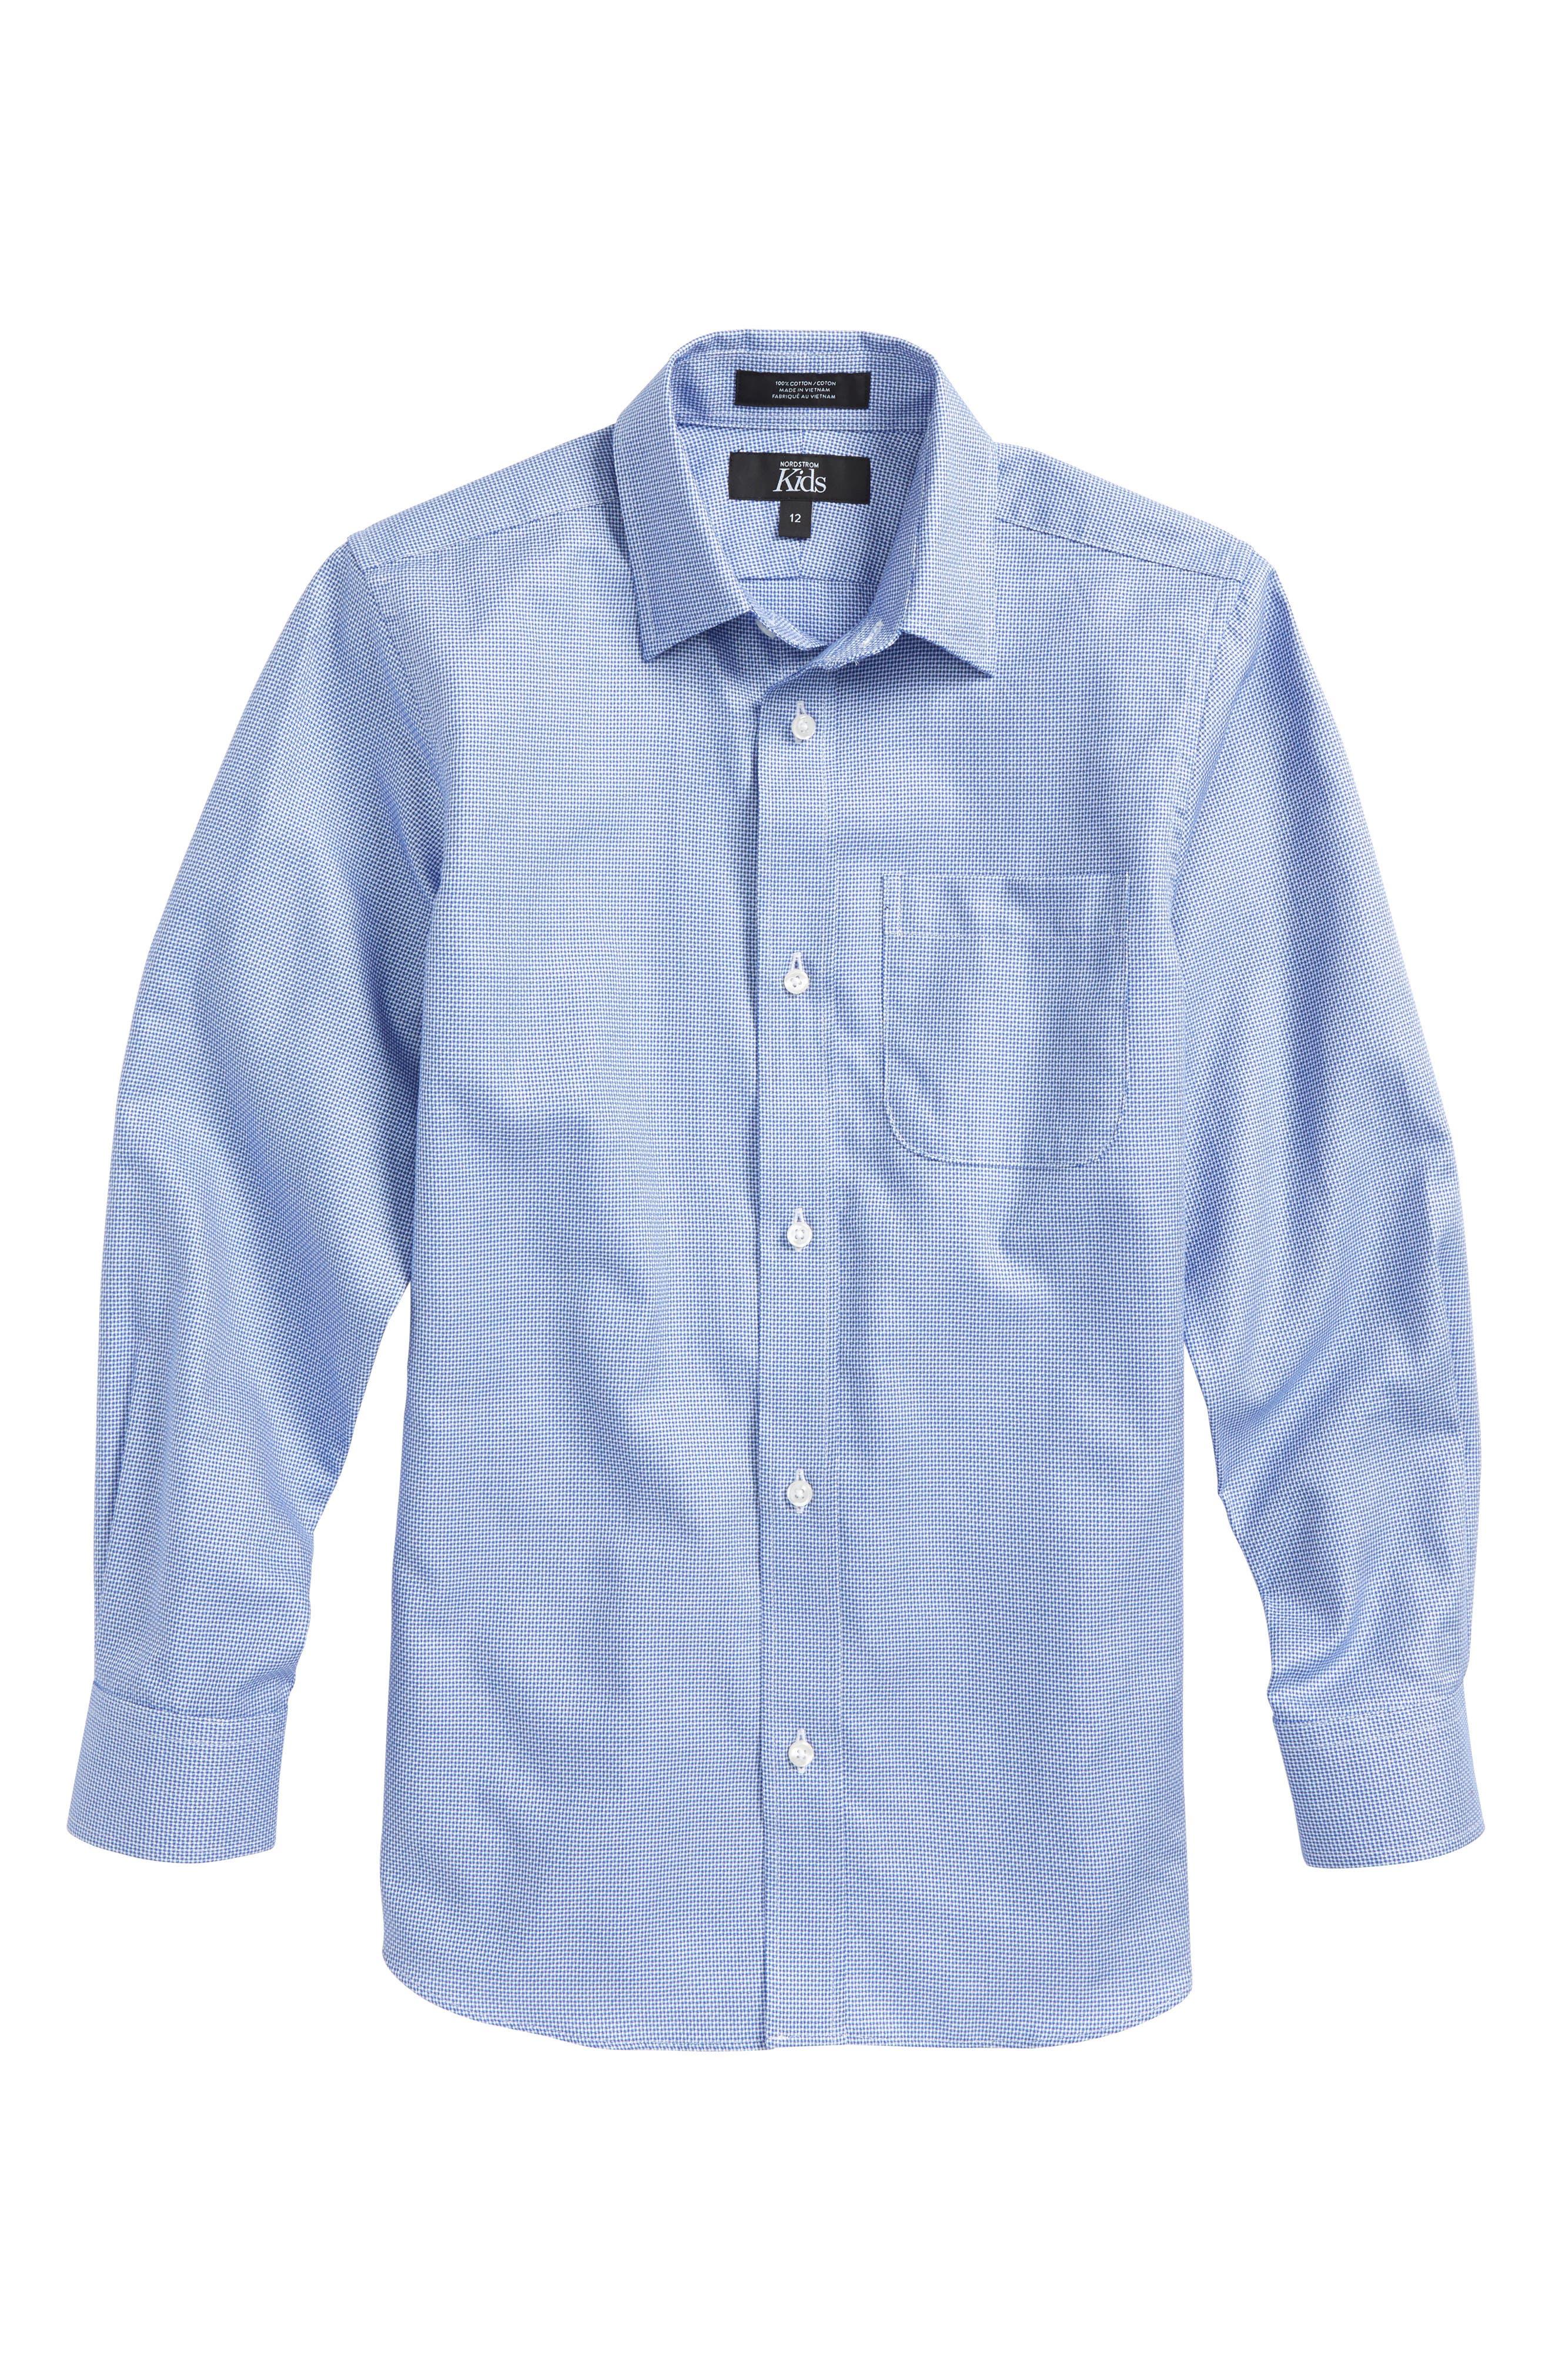 Sodalite Dobby Sport Shirt,                         Main,                         color, 420